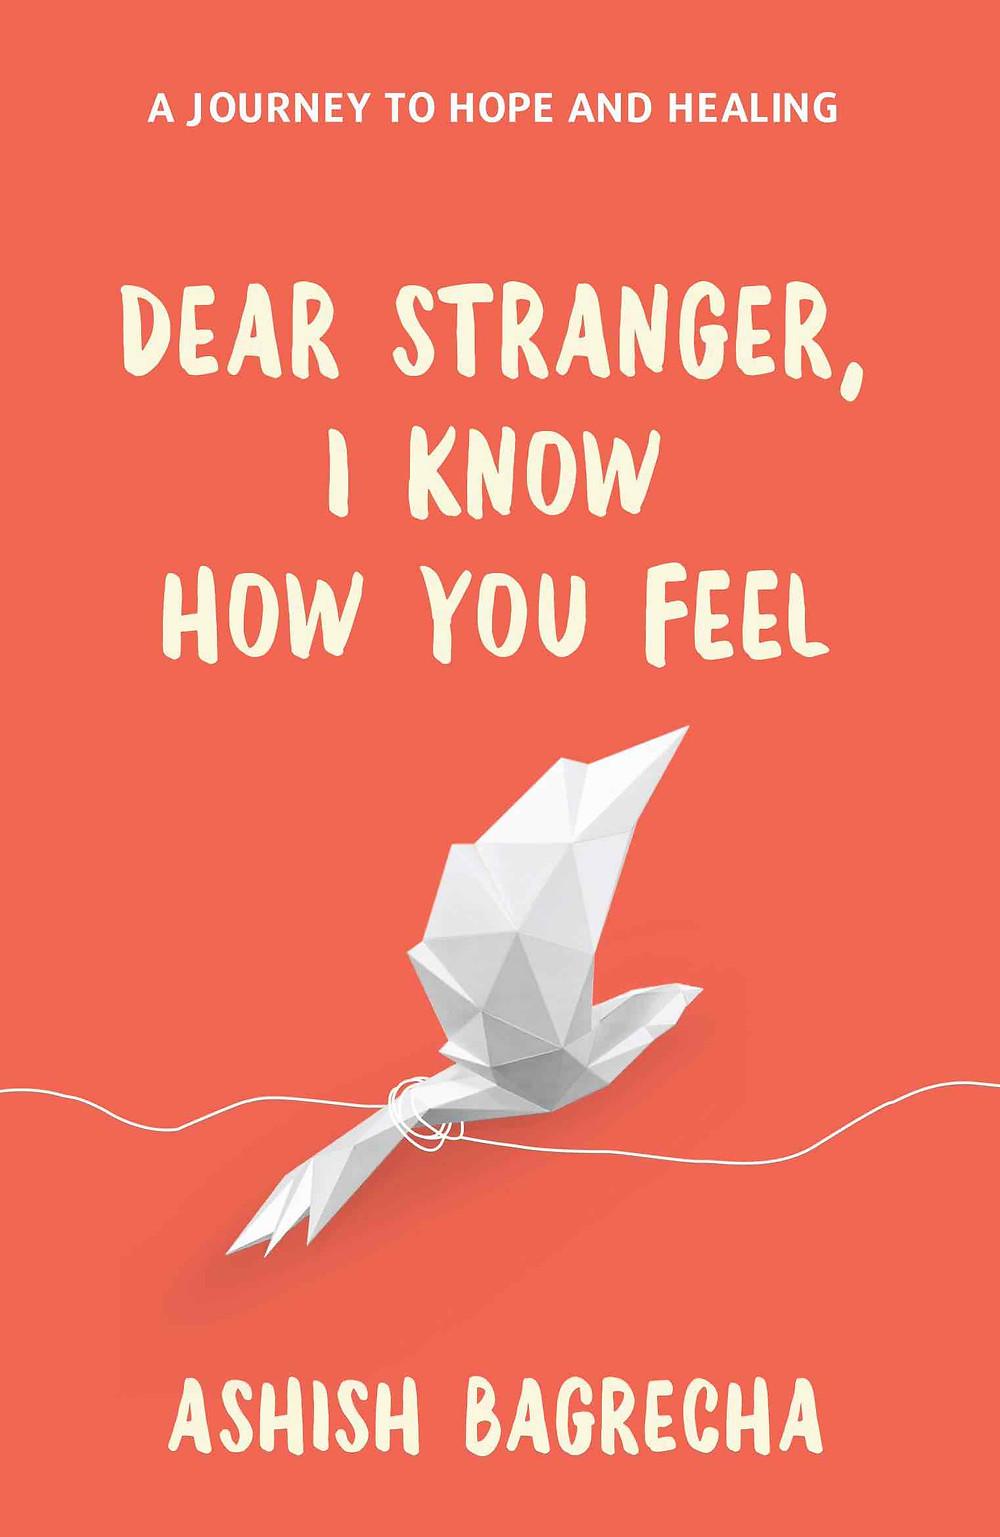 Dear Stranger, I Know How You Feel | Book Inspirational